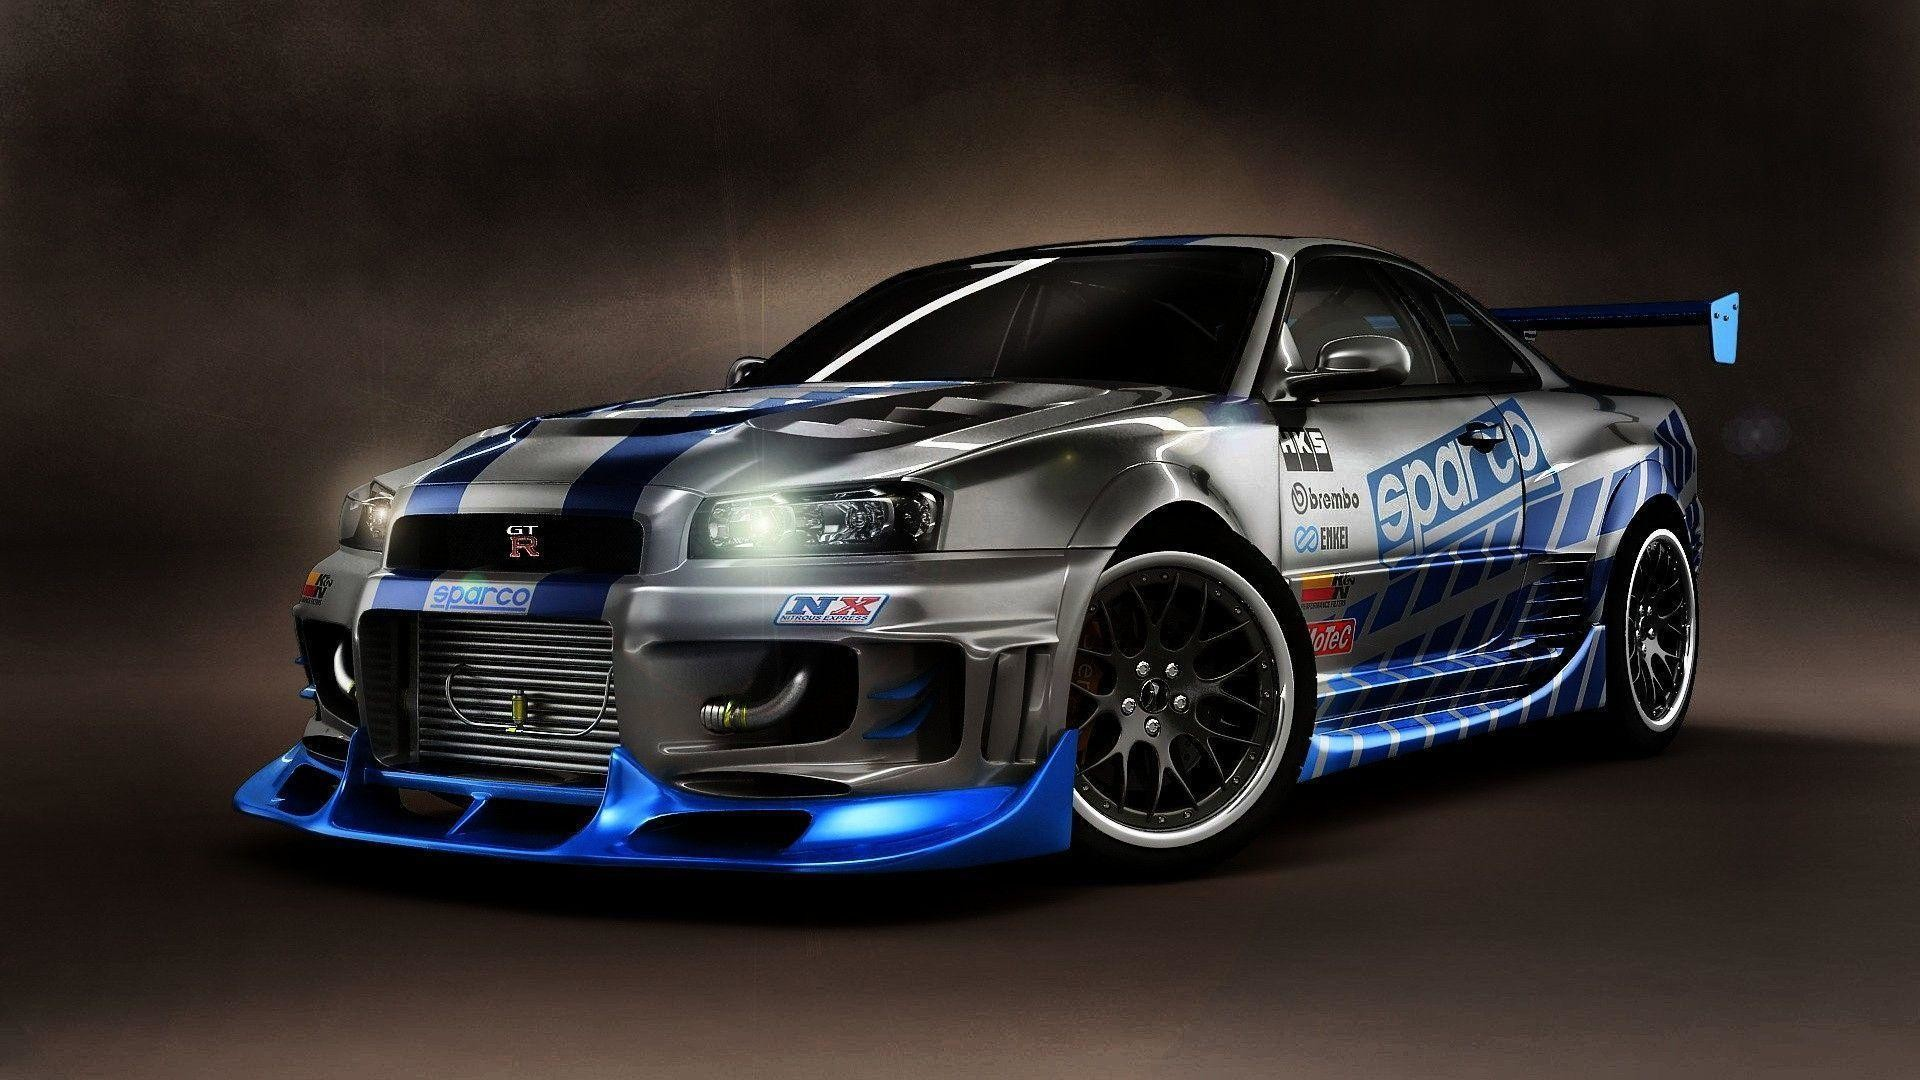 Nissan Skyline GTR R34 Wallpaper | Car Wallpaper HD